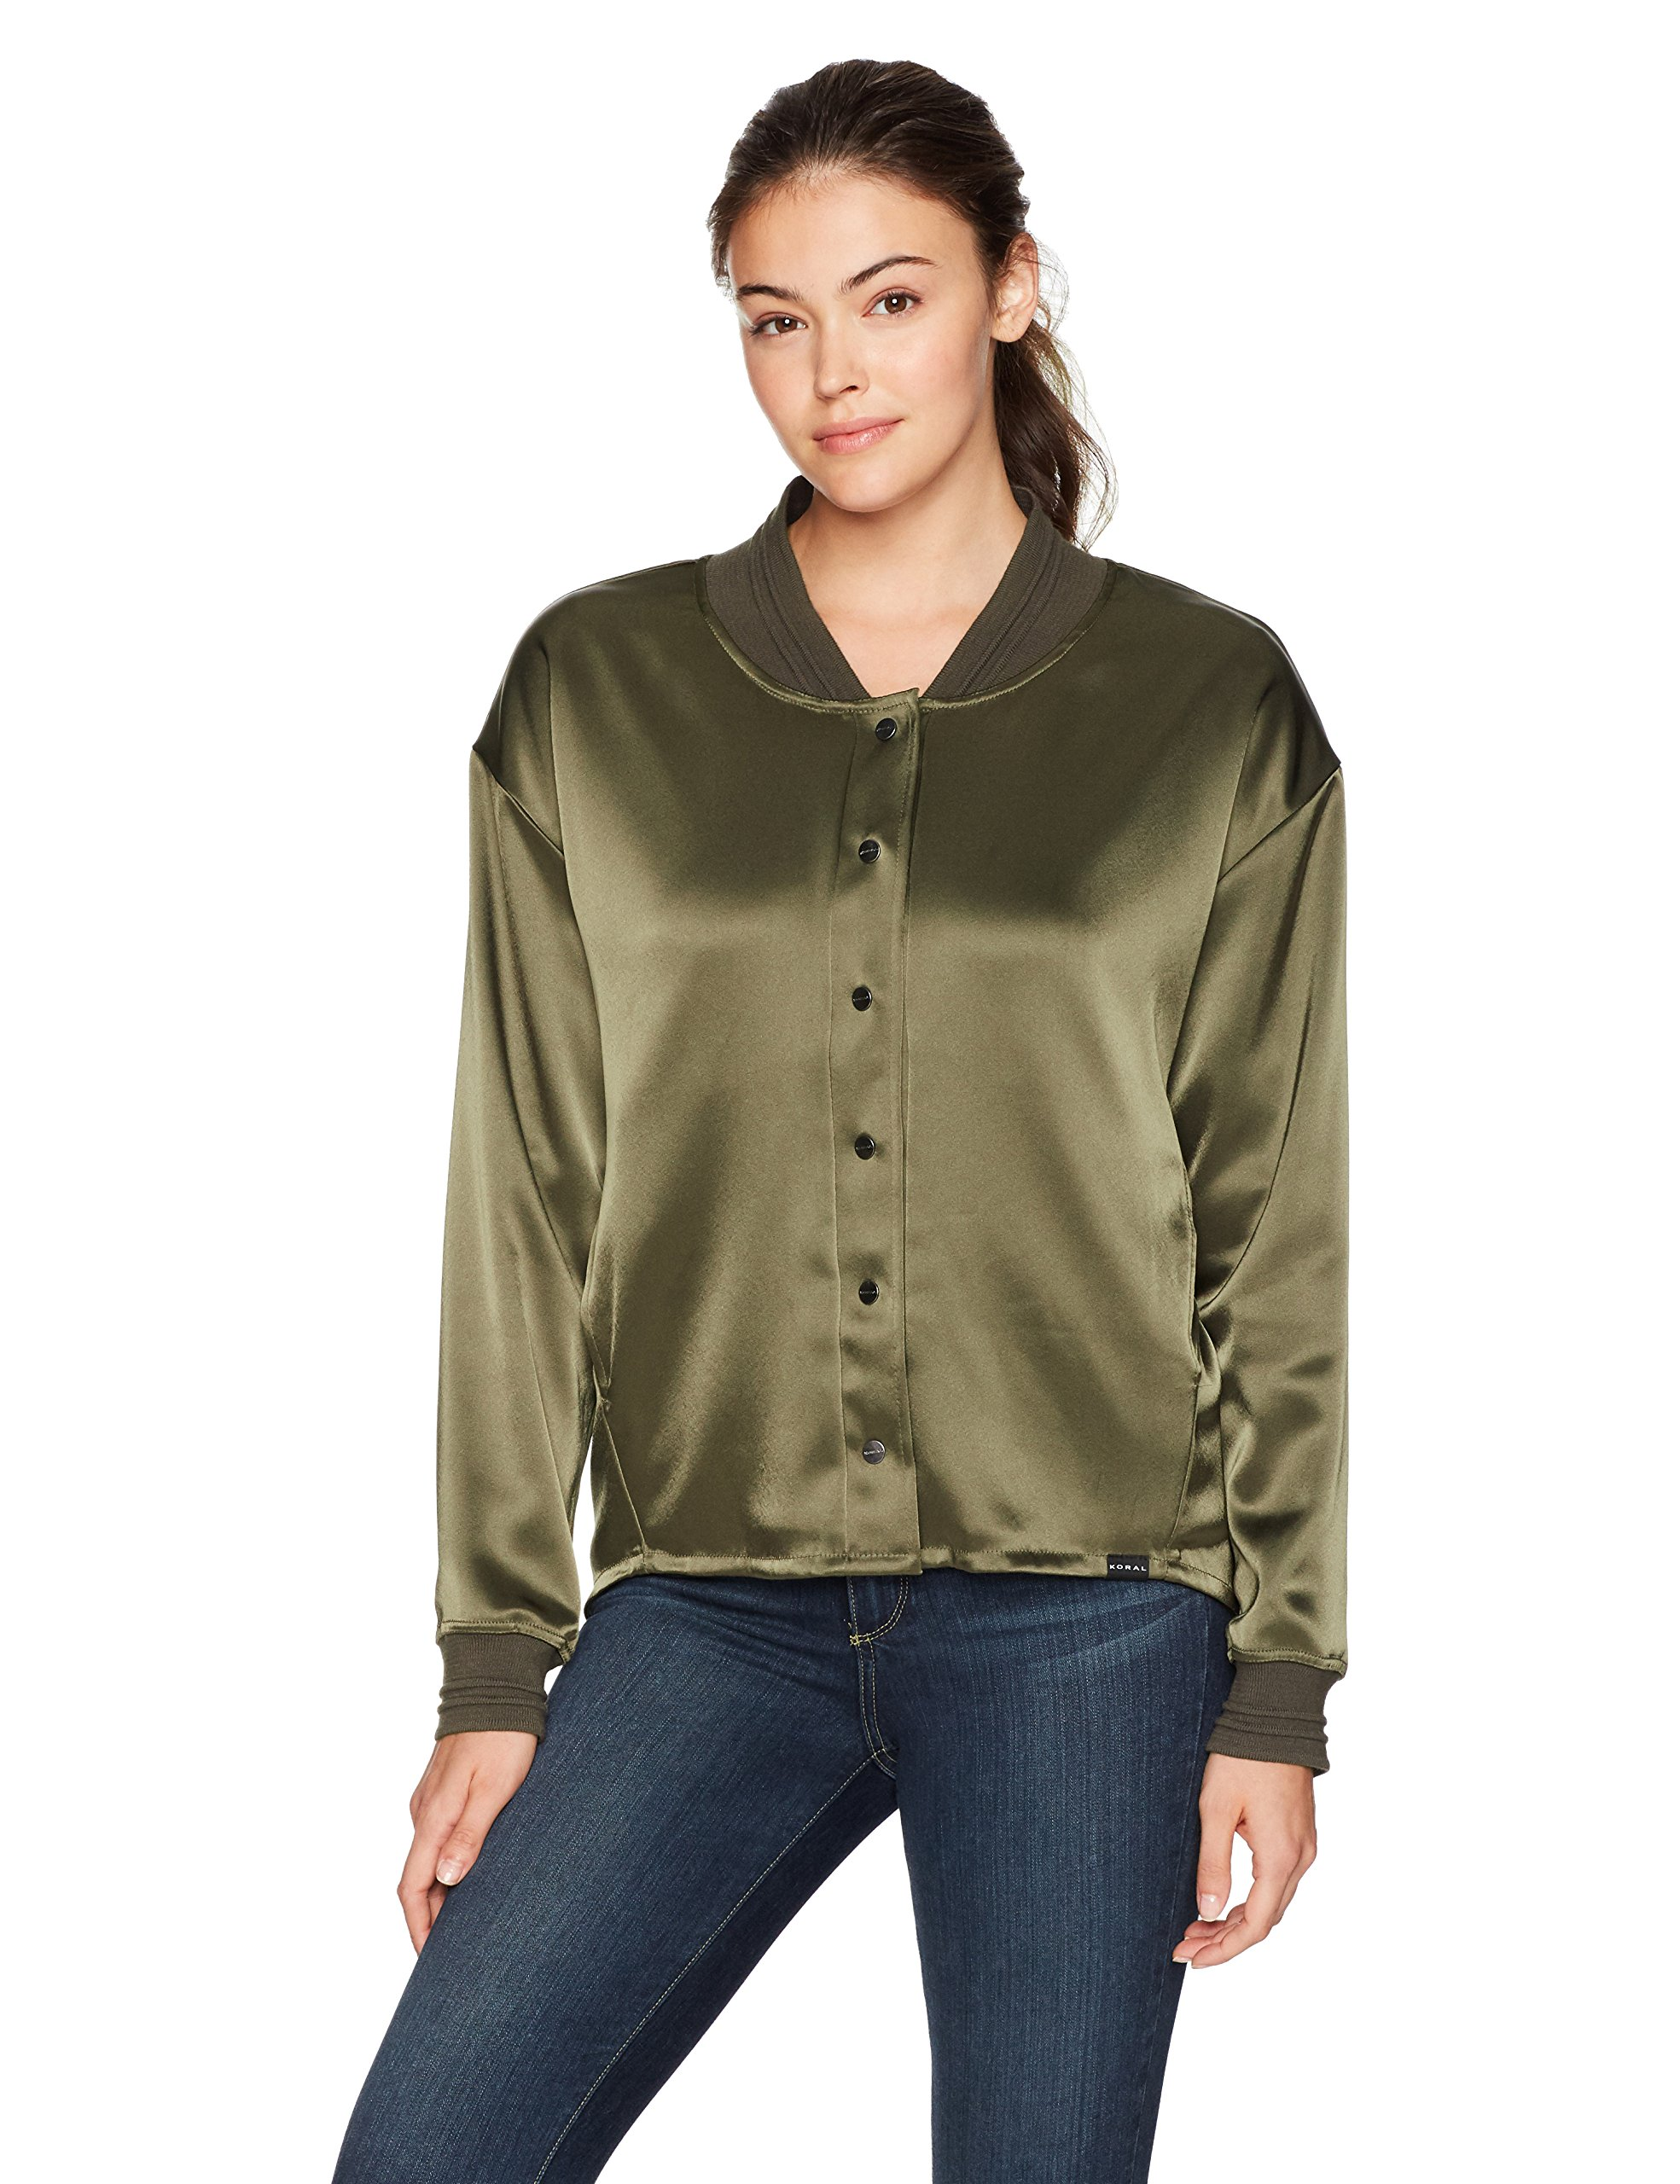 Koral Women's Brooklyn Bomber Jacket, Pine, S